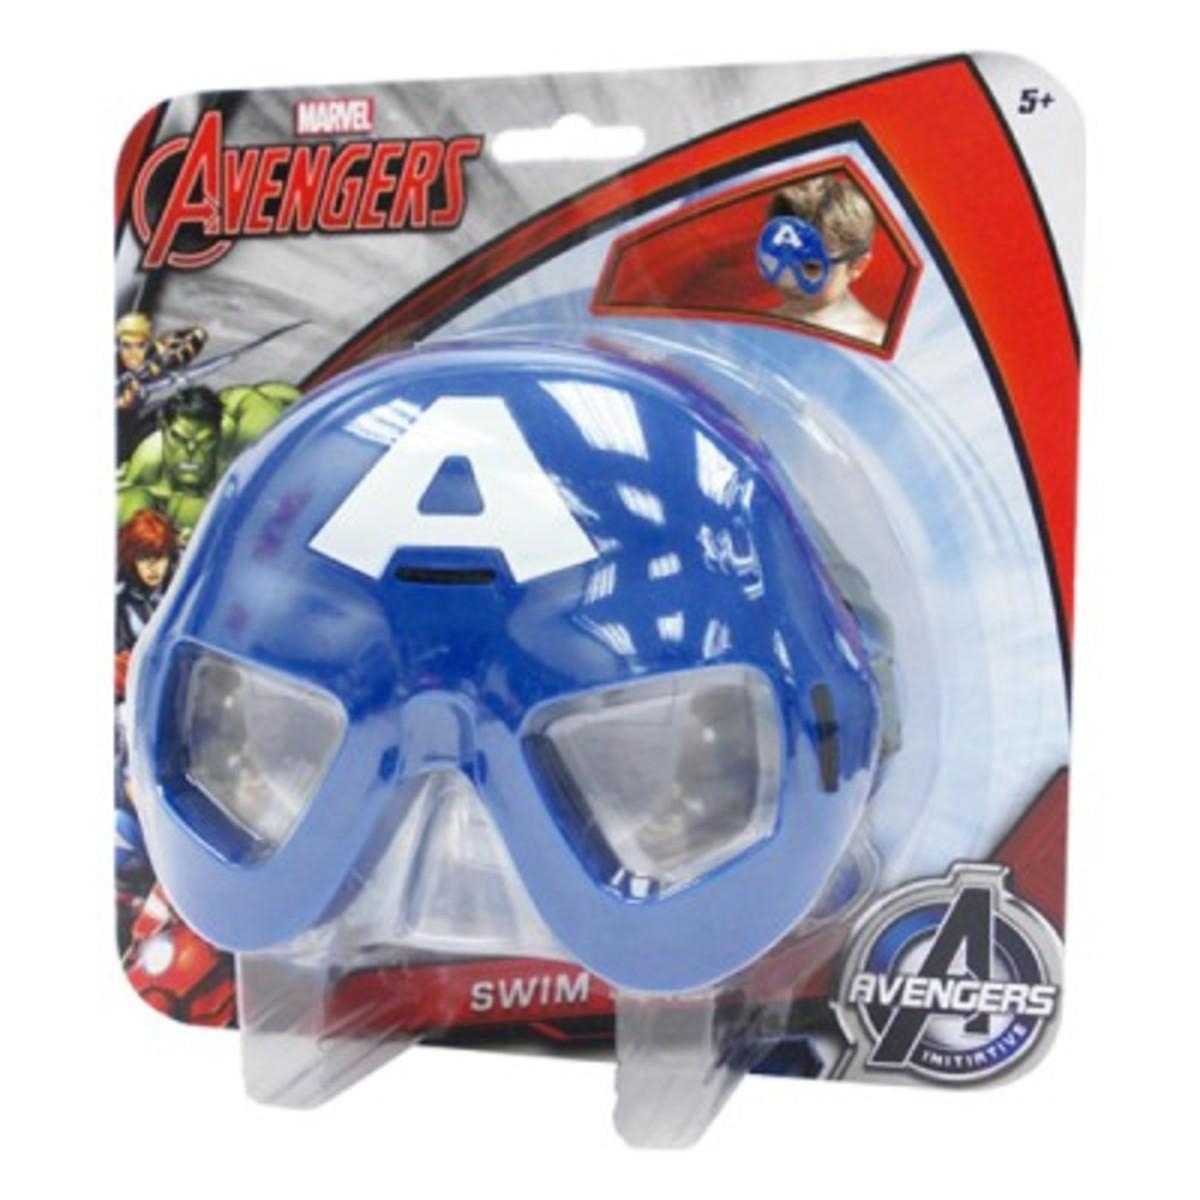 Swim Mask - Captain America (Licensed by Disney)